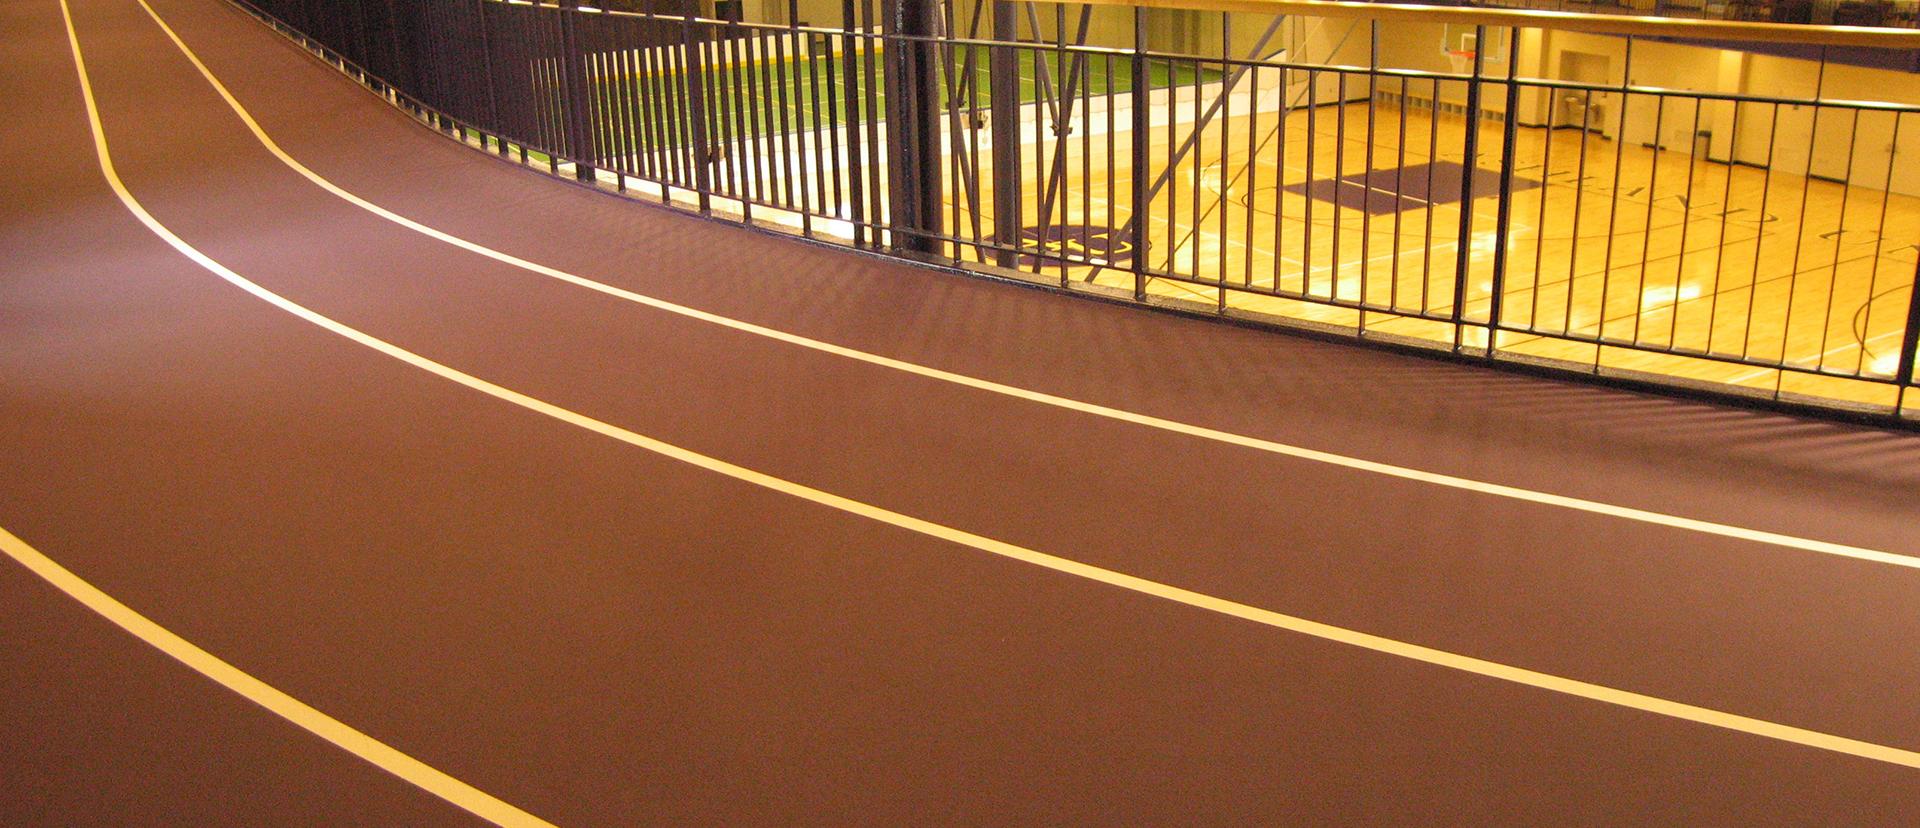 Flooring cincinnati floor for Cost to build a racquetball court